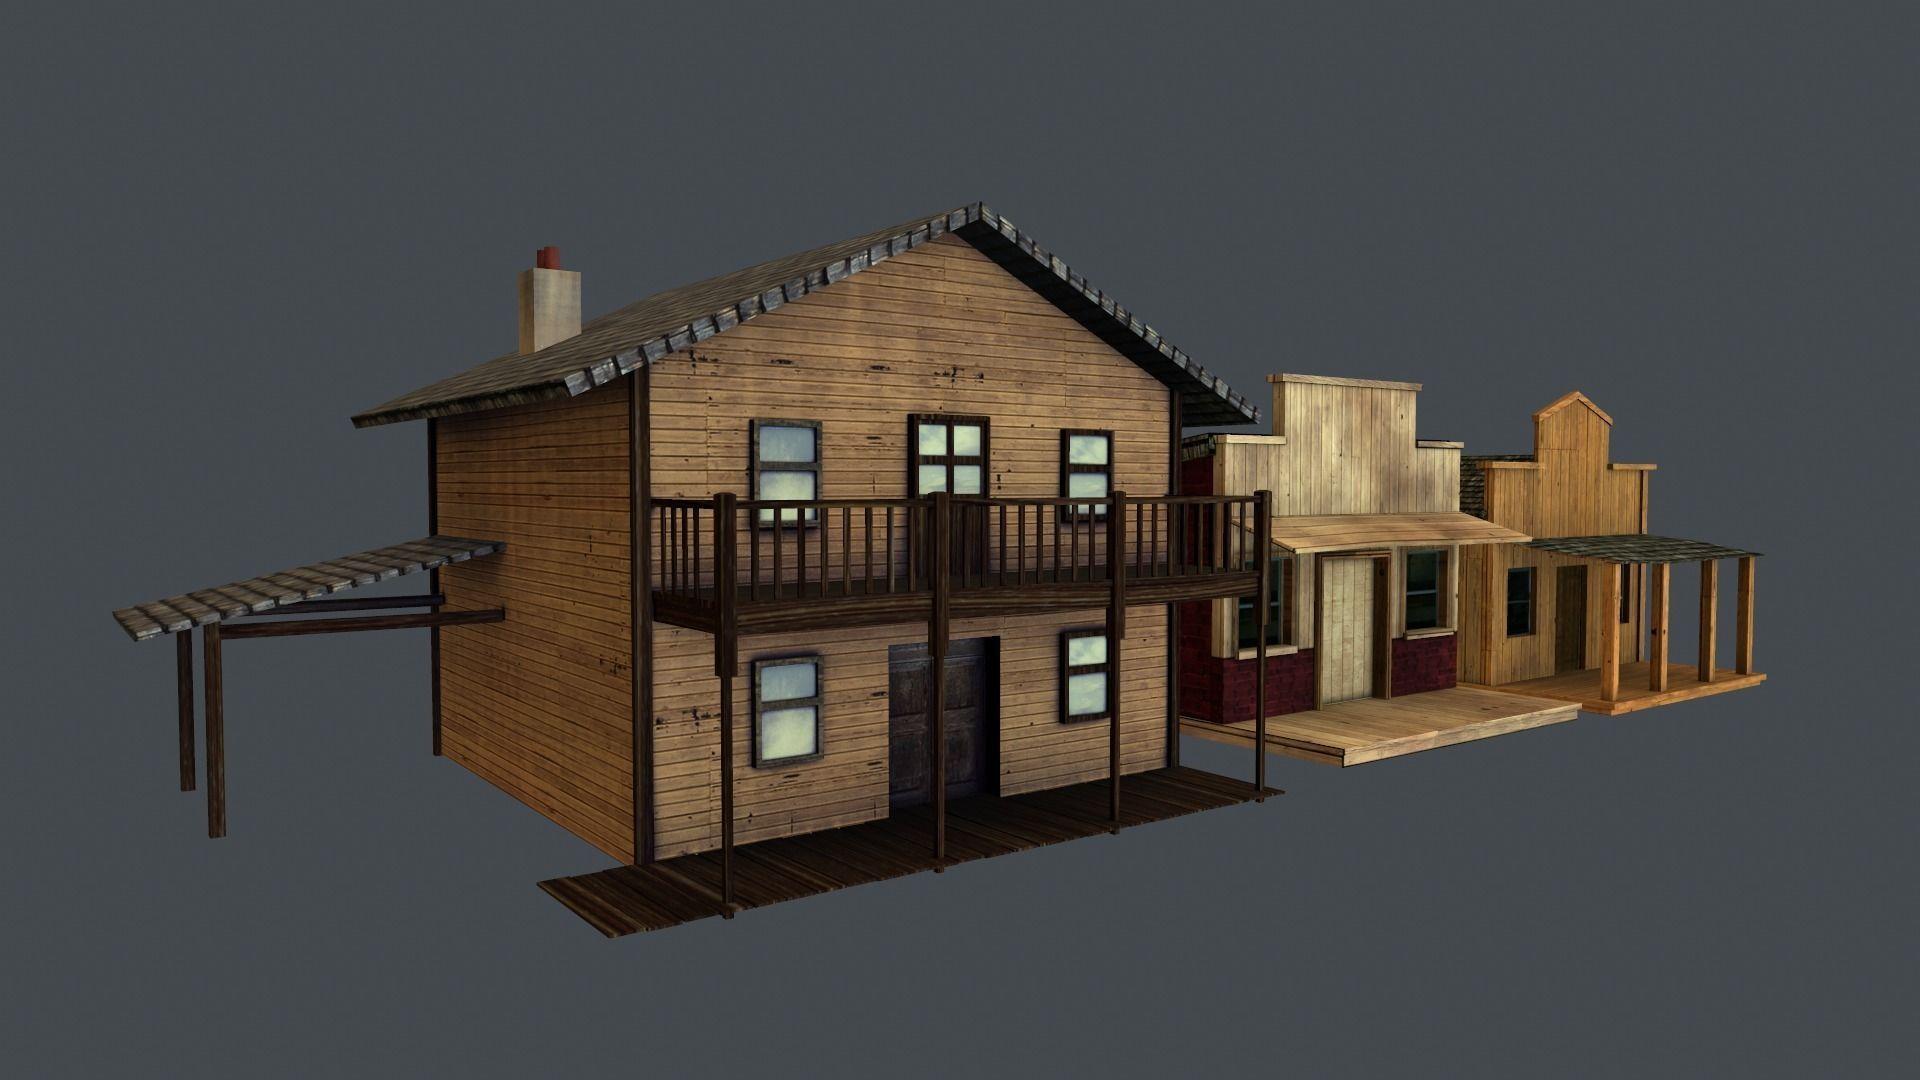 3d model western styled building low poly game ready models set of 3 vr ar low poly obj. Black Bedroom Furniture Sets. Home Design Ideas